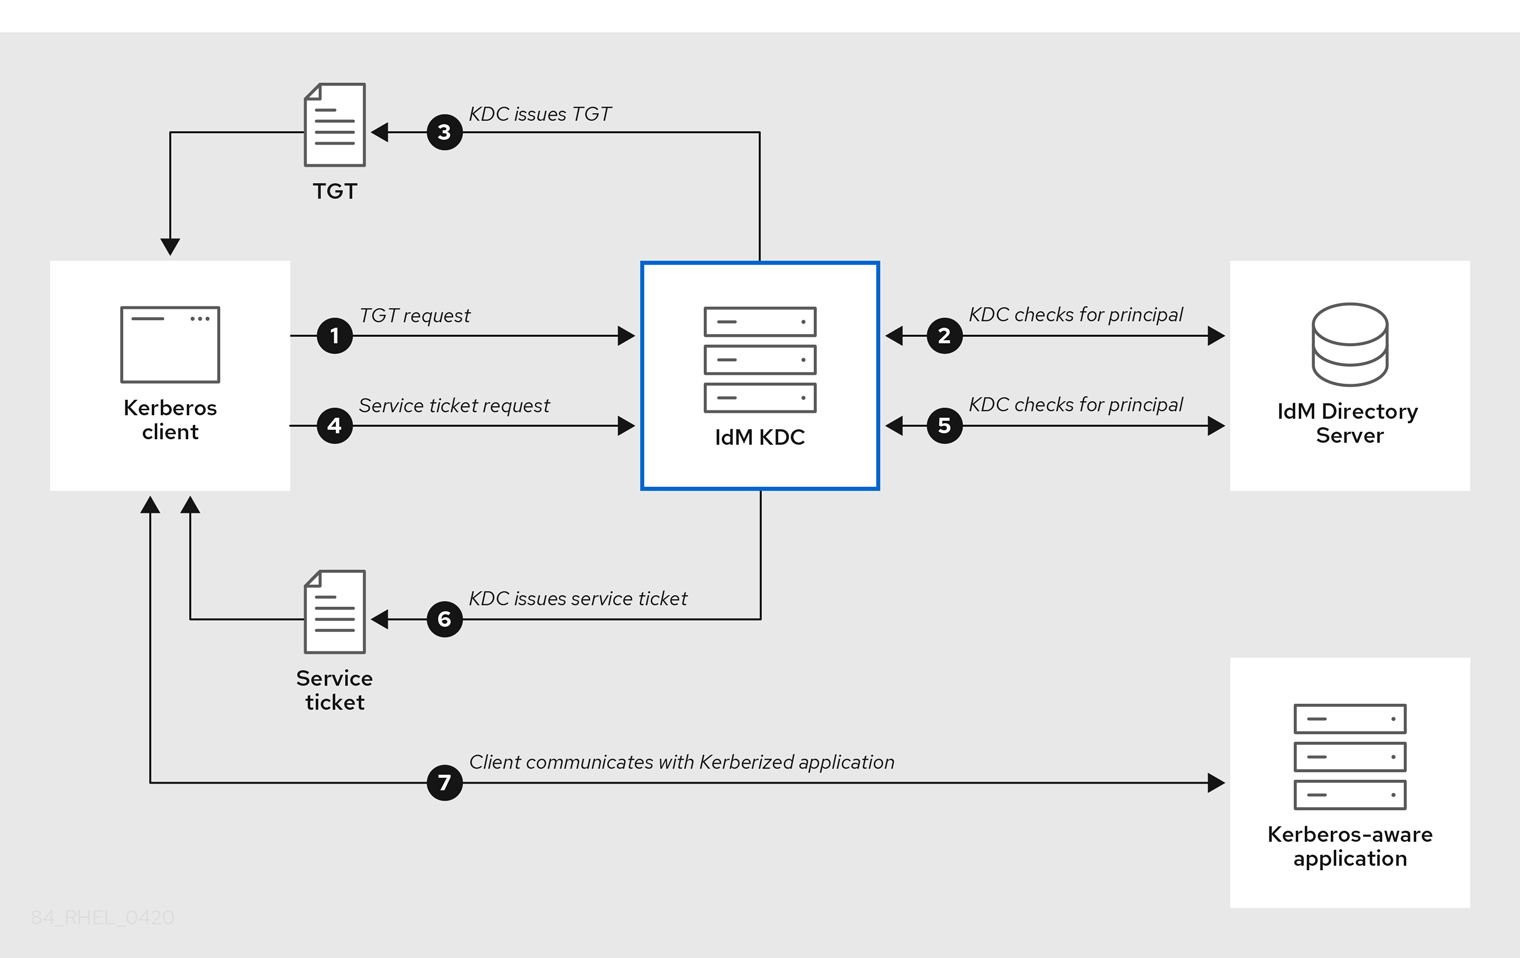 Kerberos KDC flow of communication